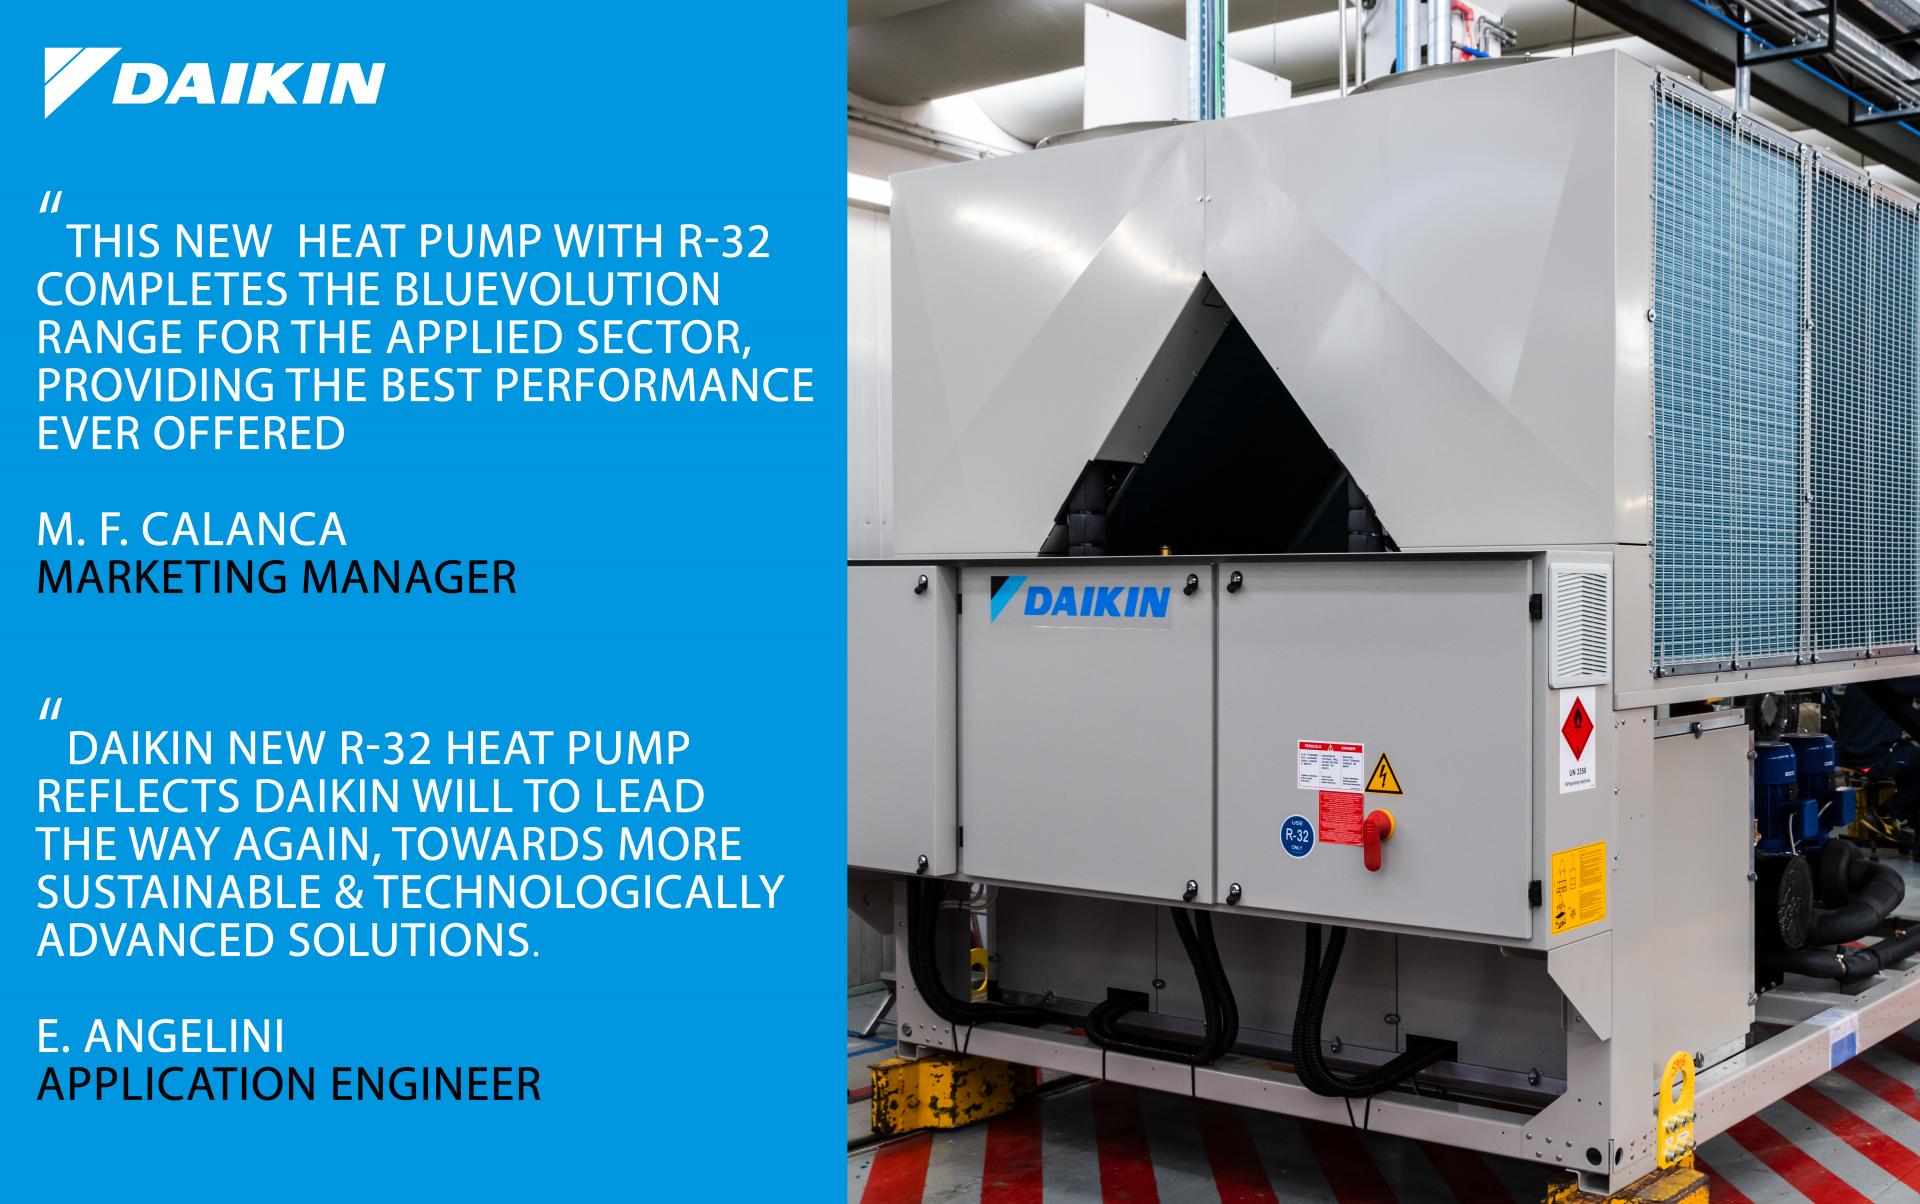 Daikin EWYT-B- R-32 heat pump